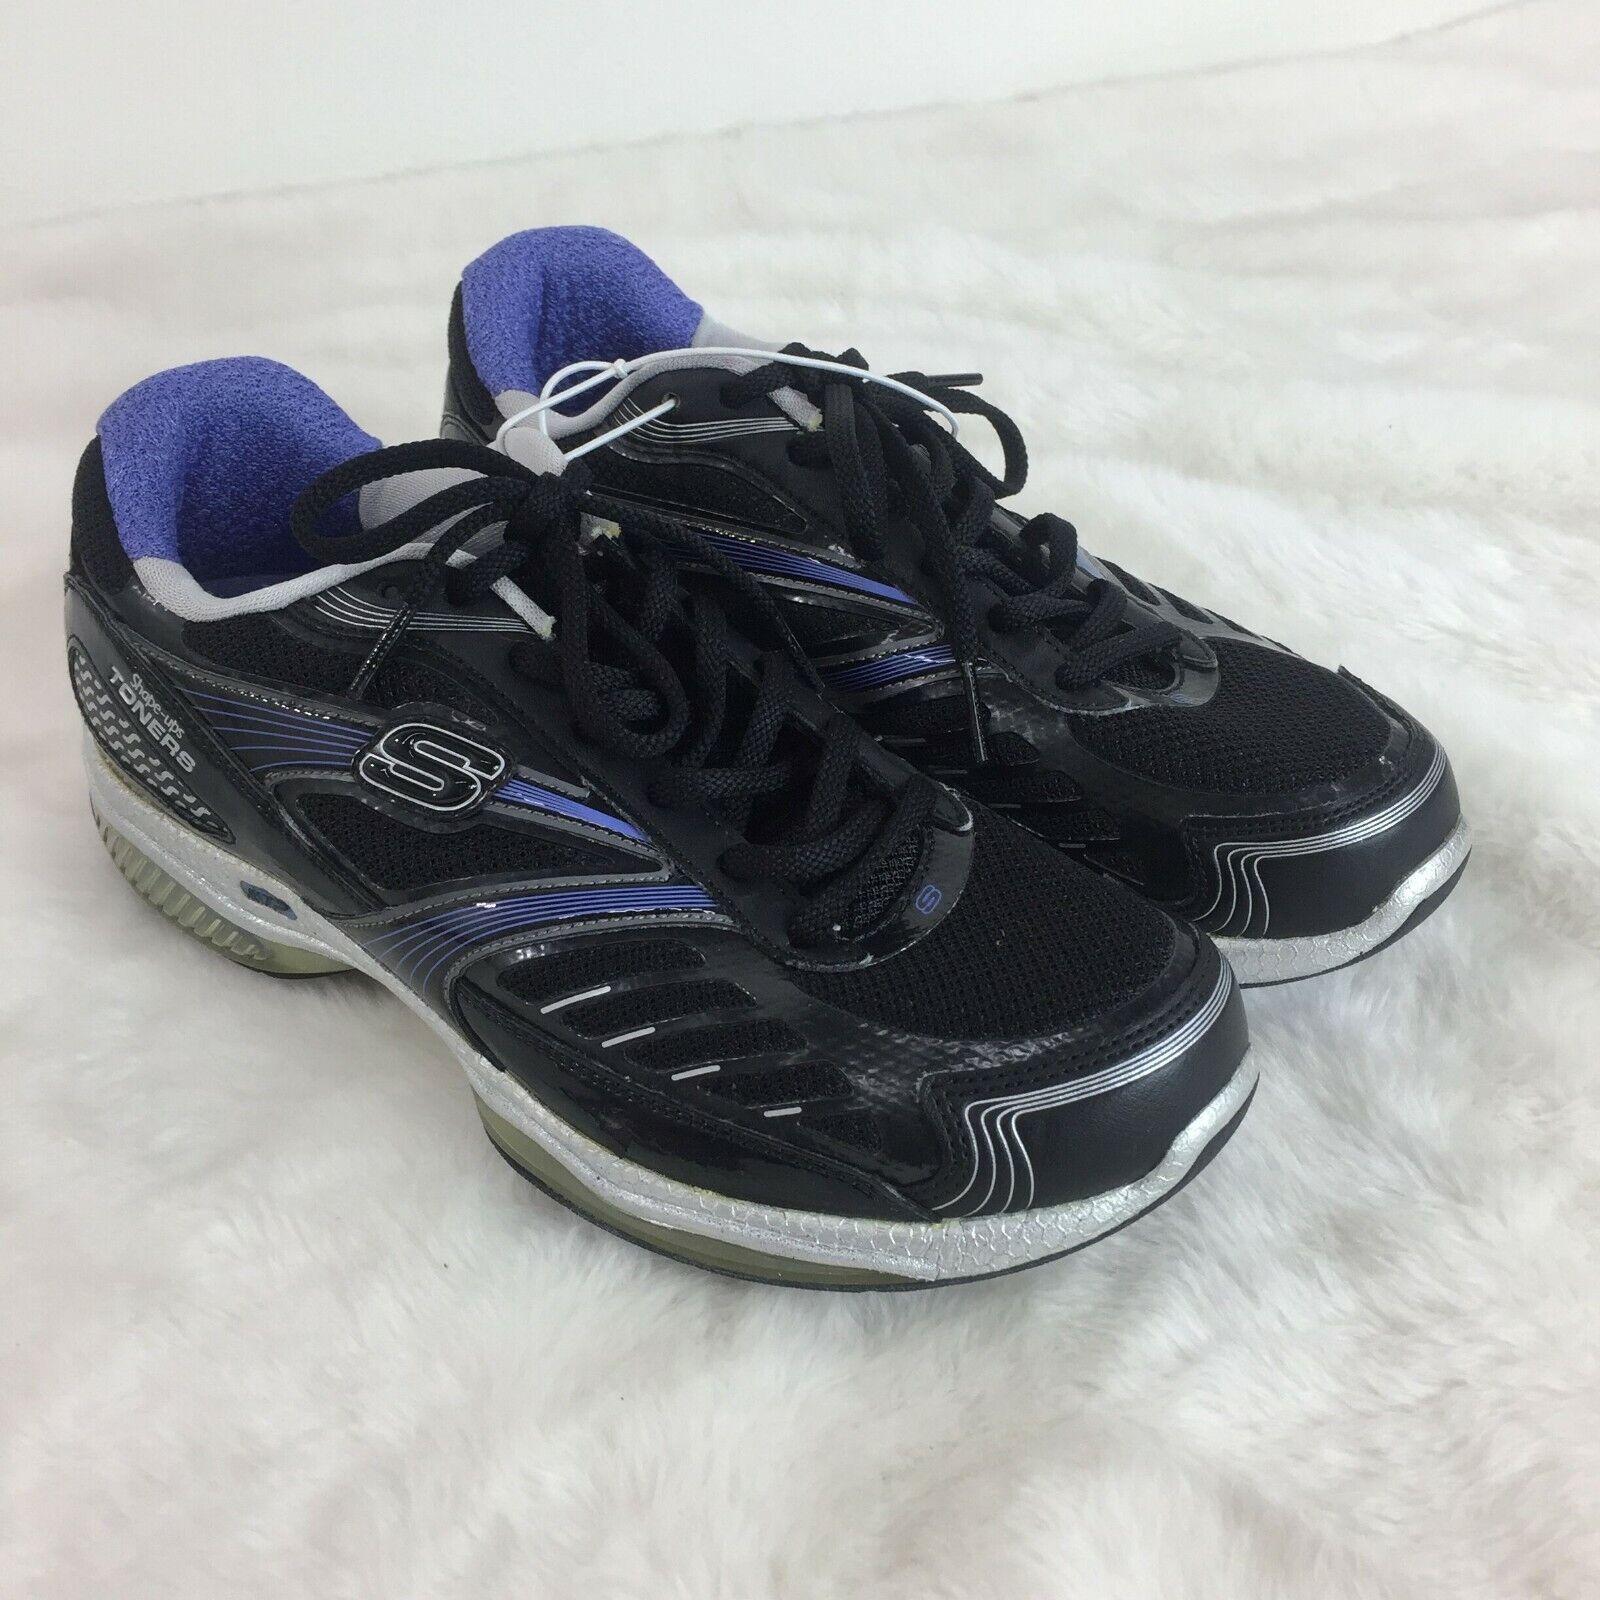 zapatos skechers ultimos modelos zara invierno azul